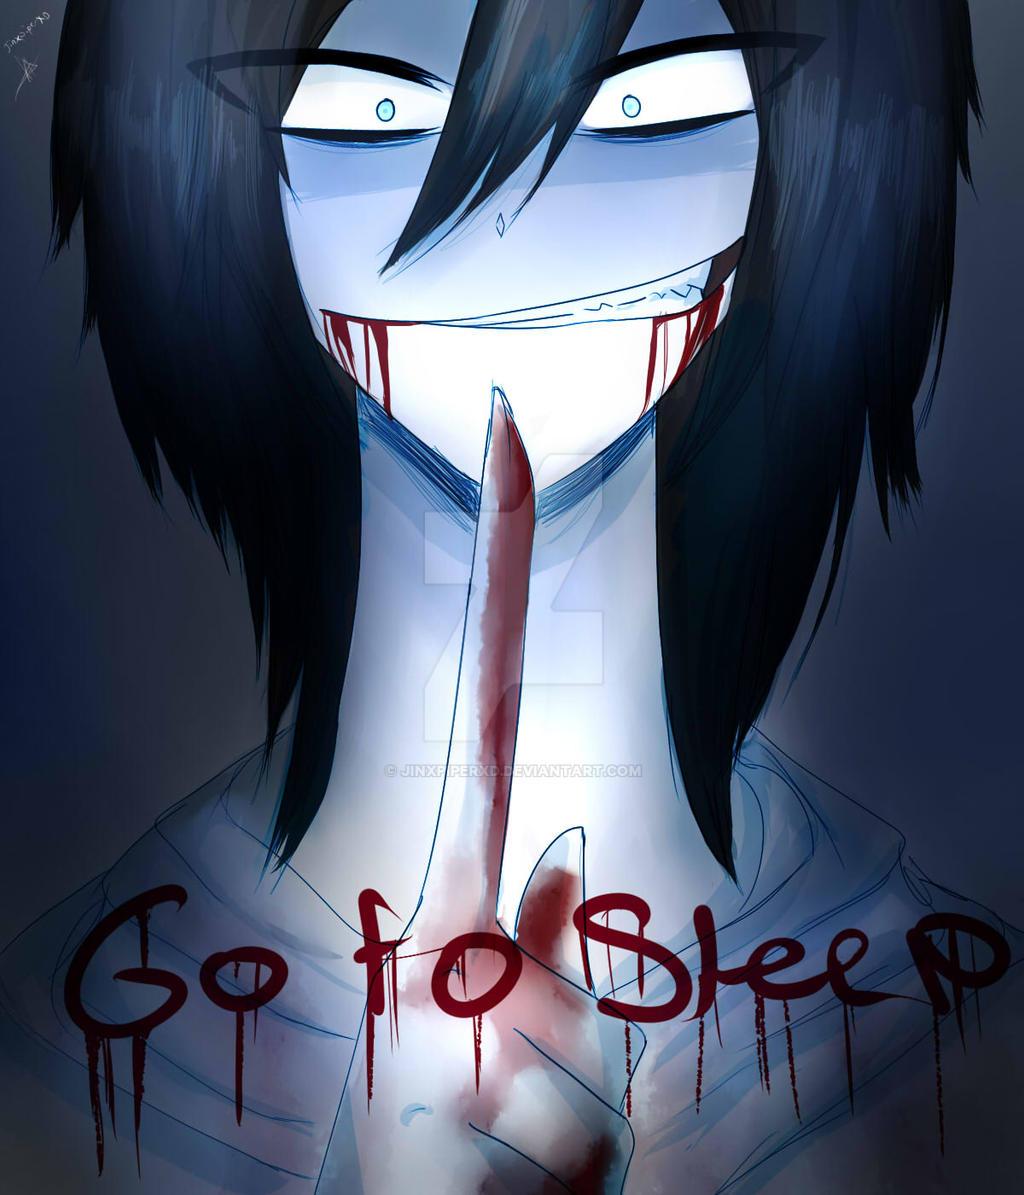 Anime Jeff The Killer Go To Sleep Gallery